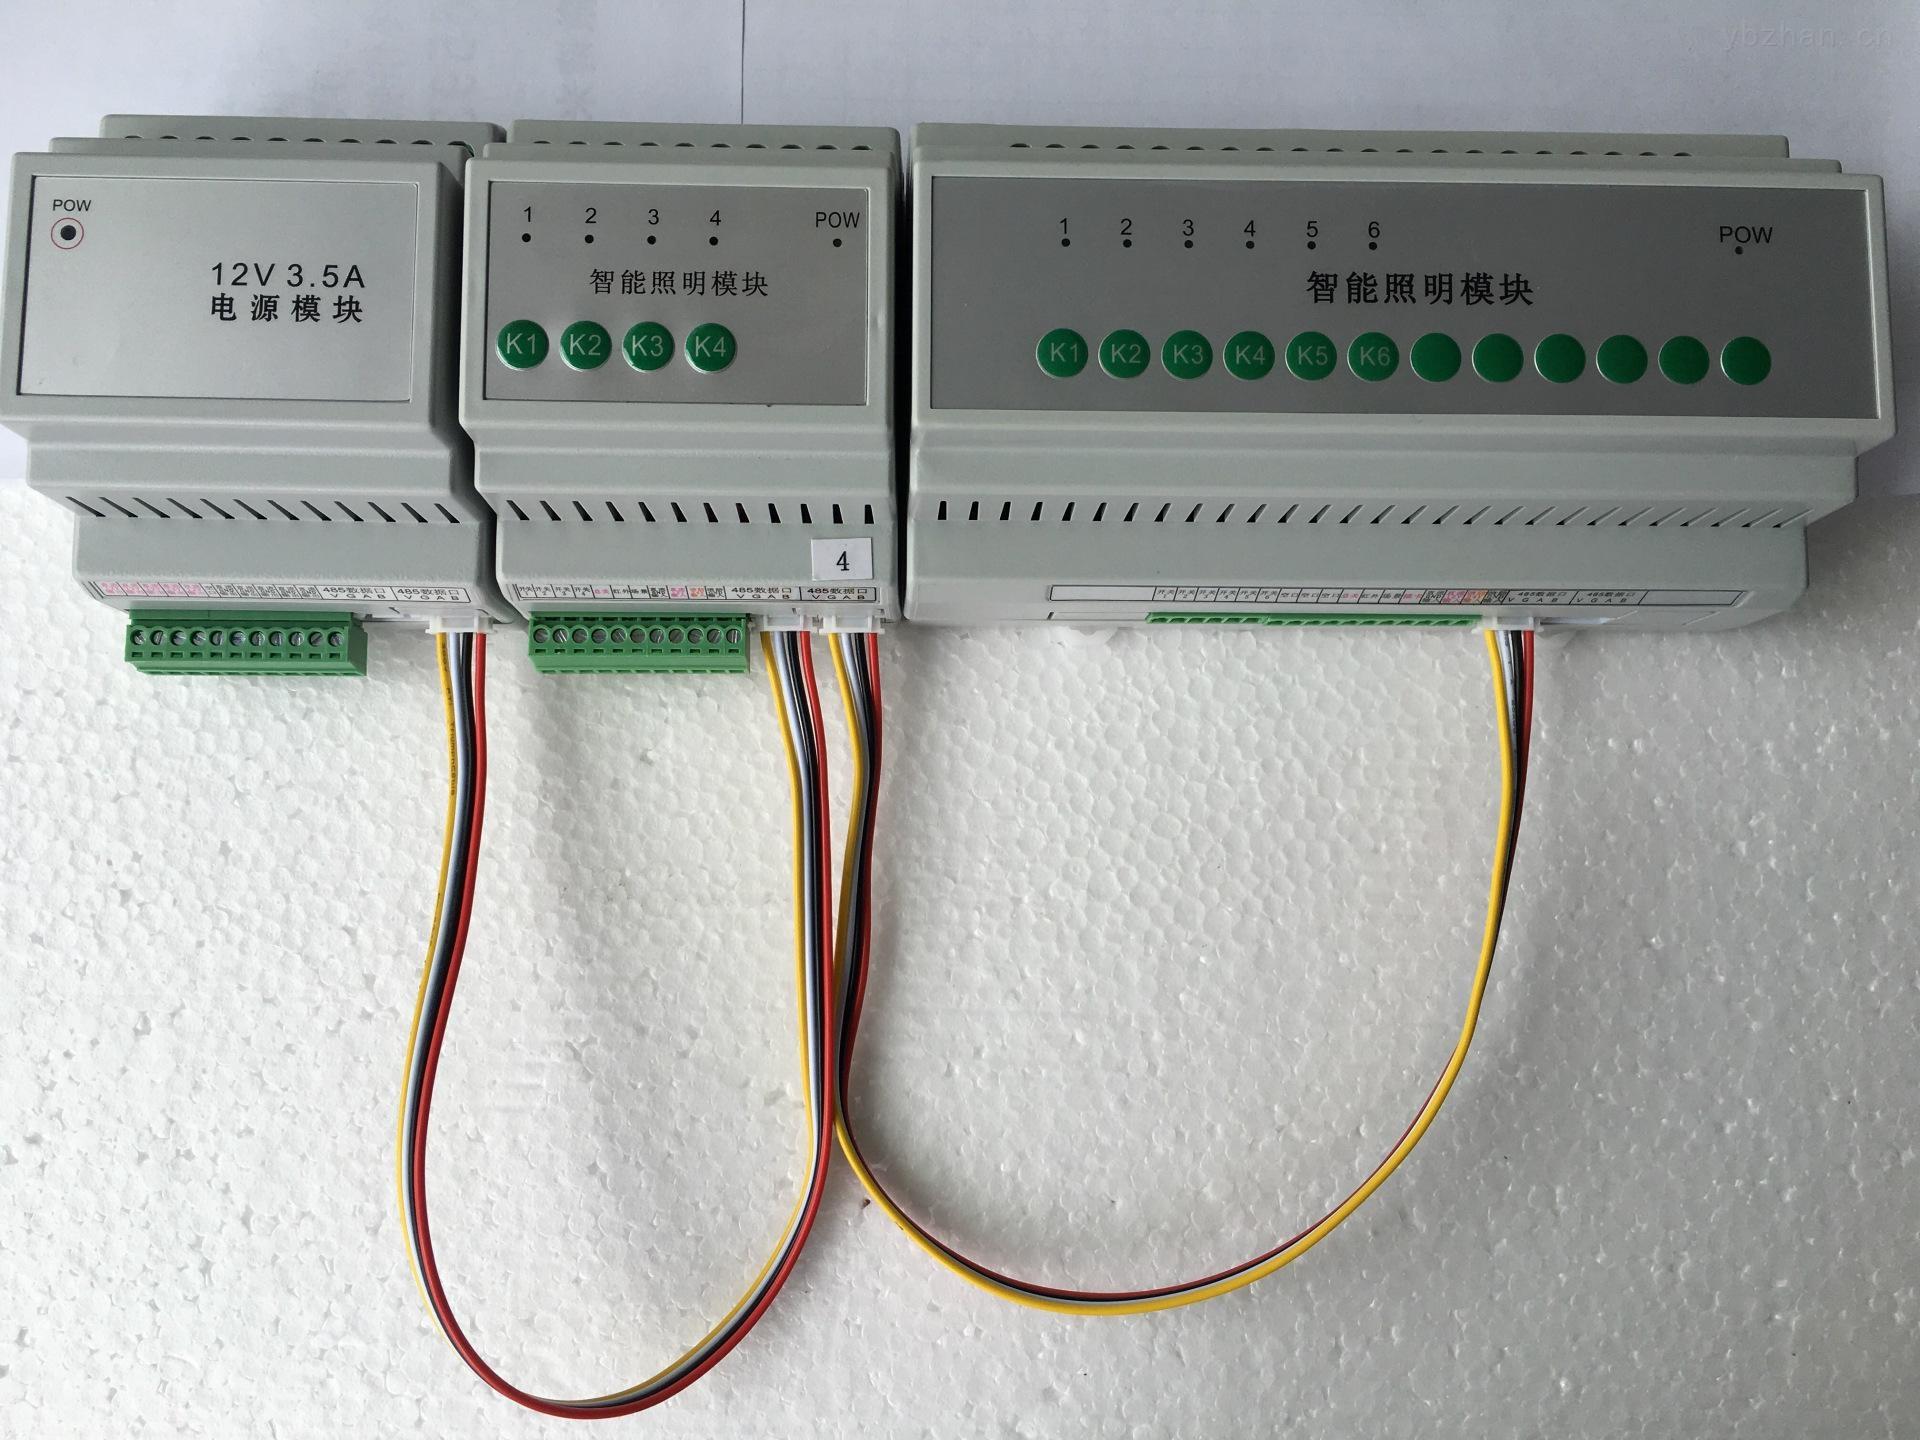 SA/S6.16.1-SA/S6.16.1智能照明控制模塊 8路20A